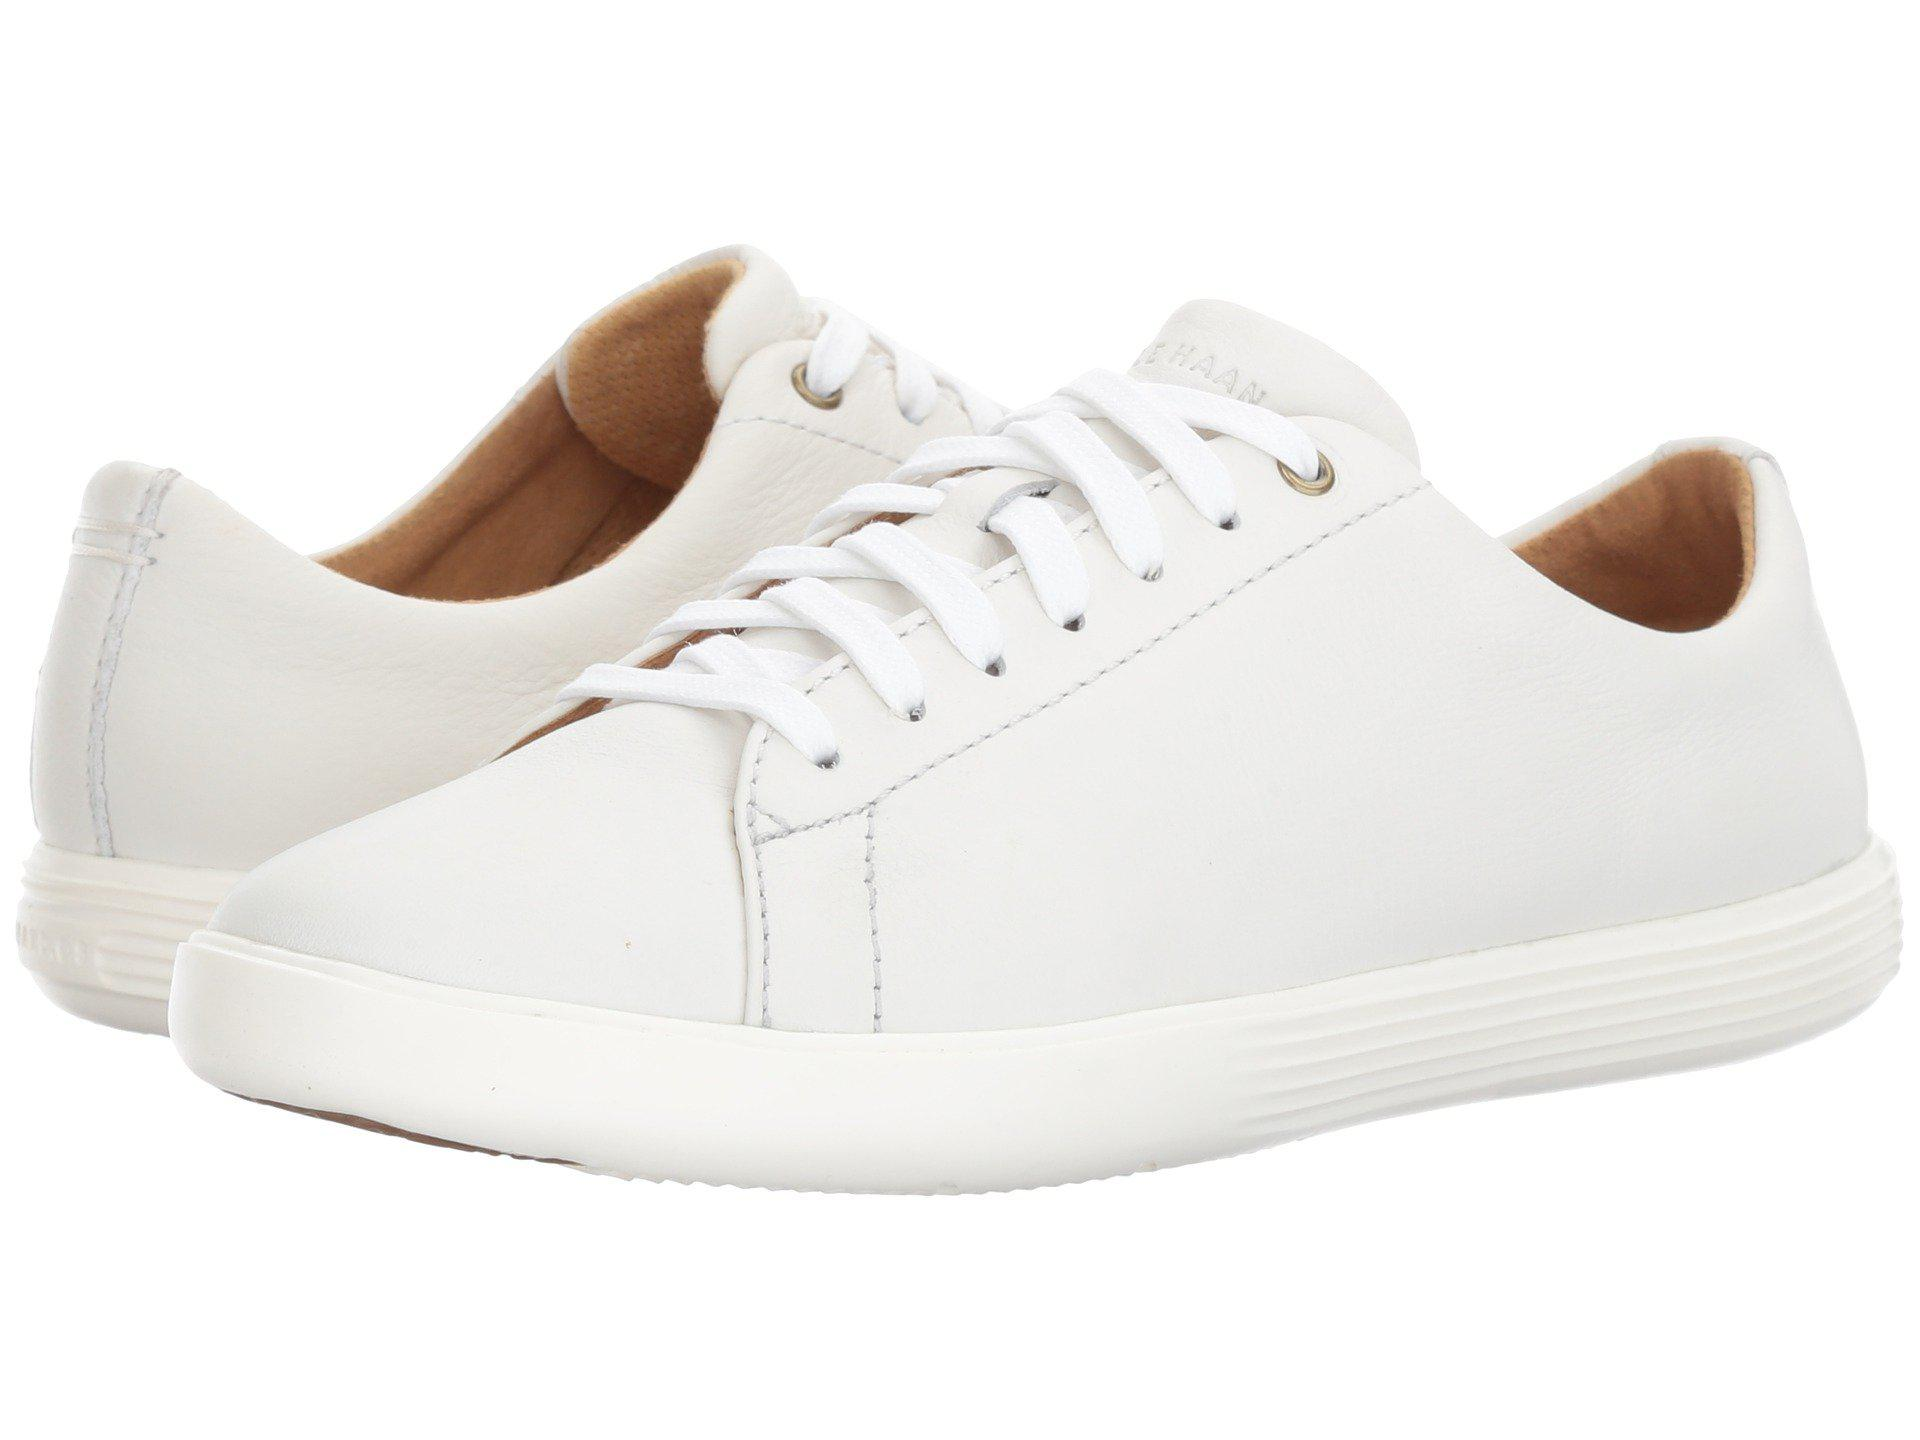 d1743cca5282 Lyst - Cole Haan Grand Crosscourt Ii in White